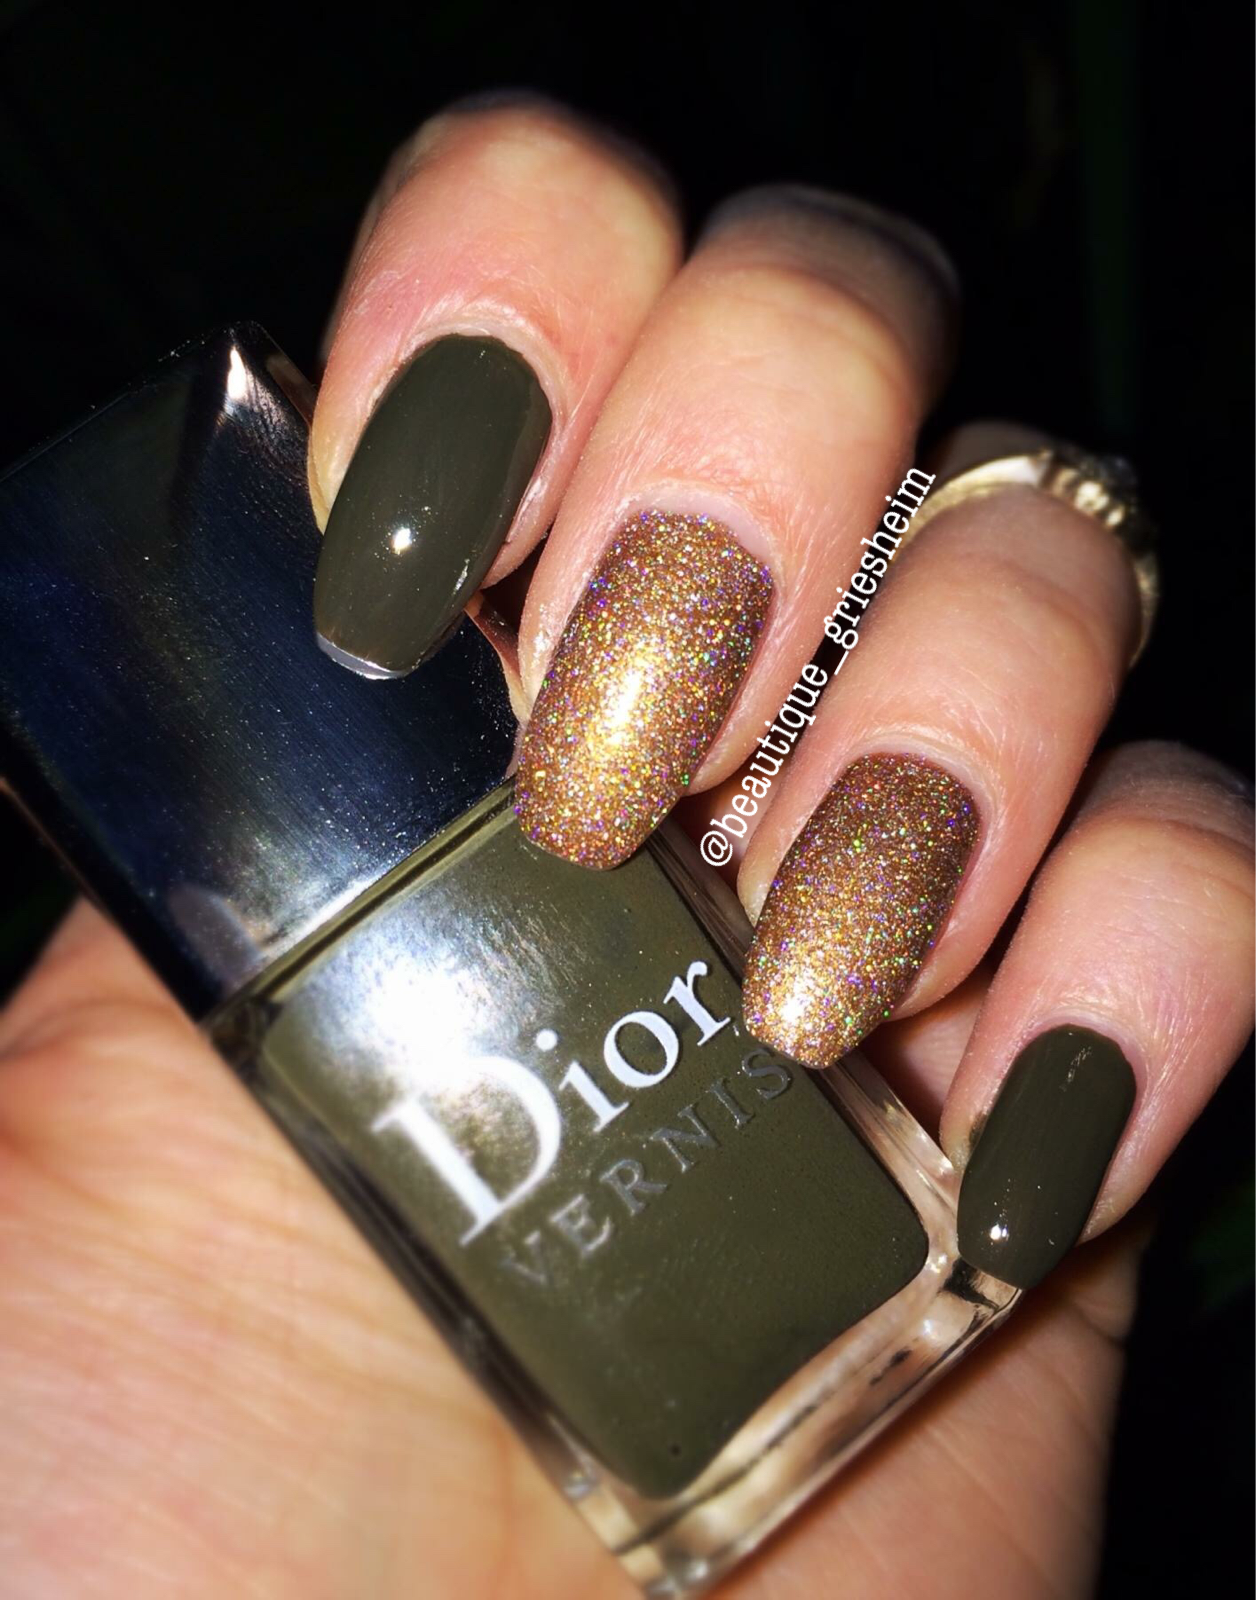 Khaki / Gold Holo Coffin Nails Polish Dior Vernis | BEAUTIQUE ...